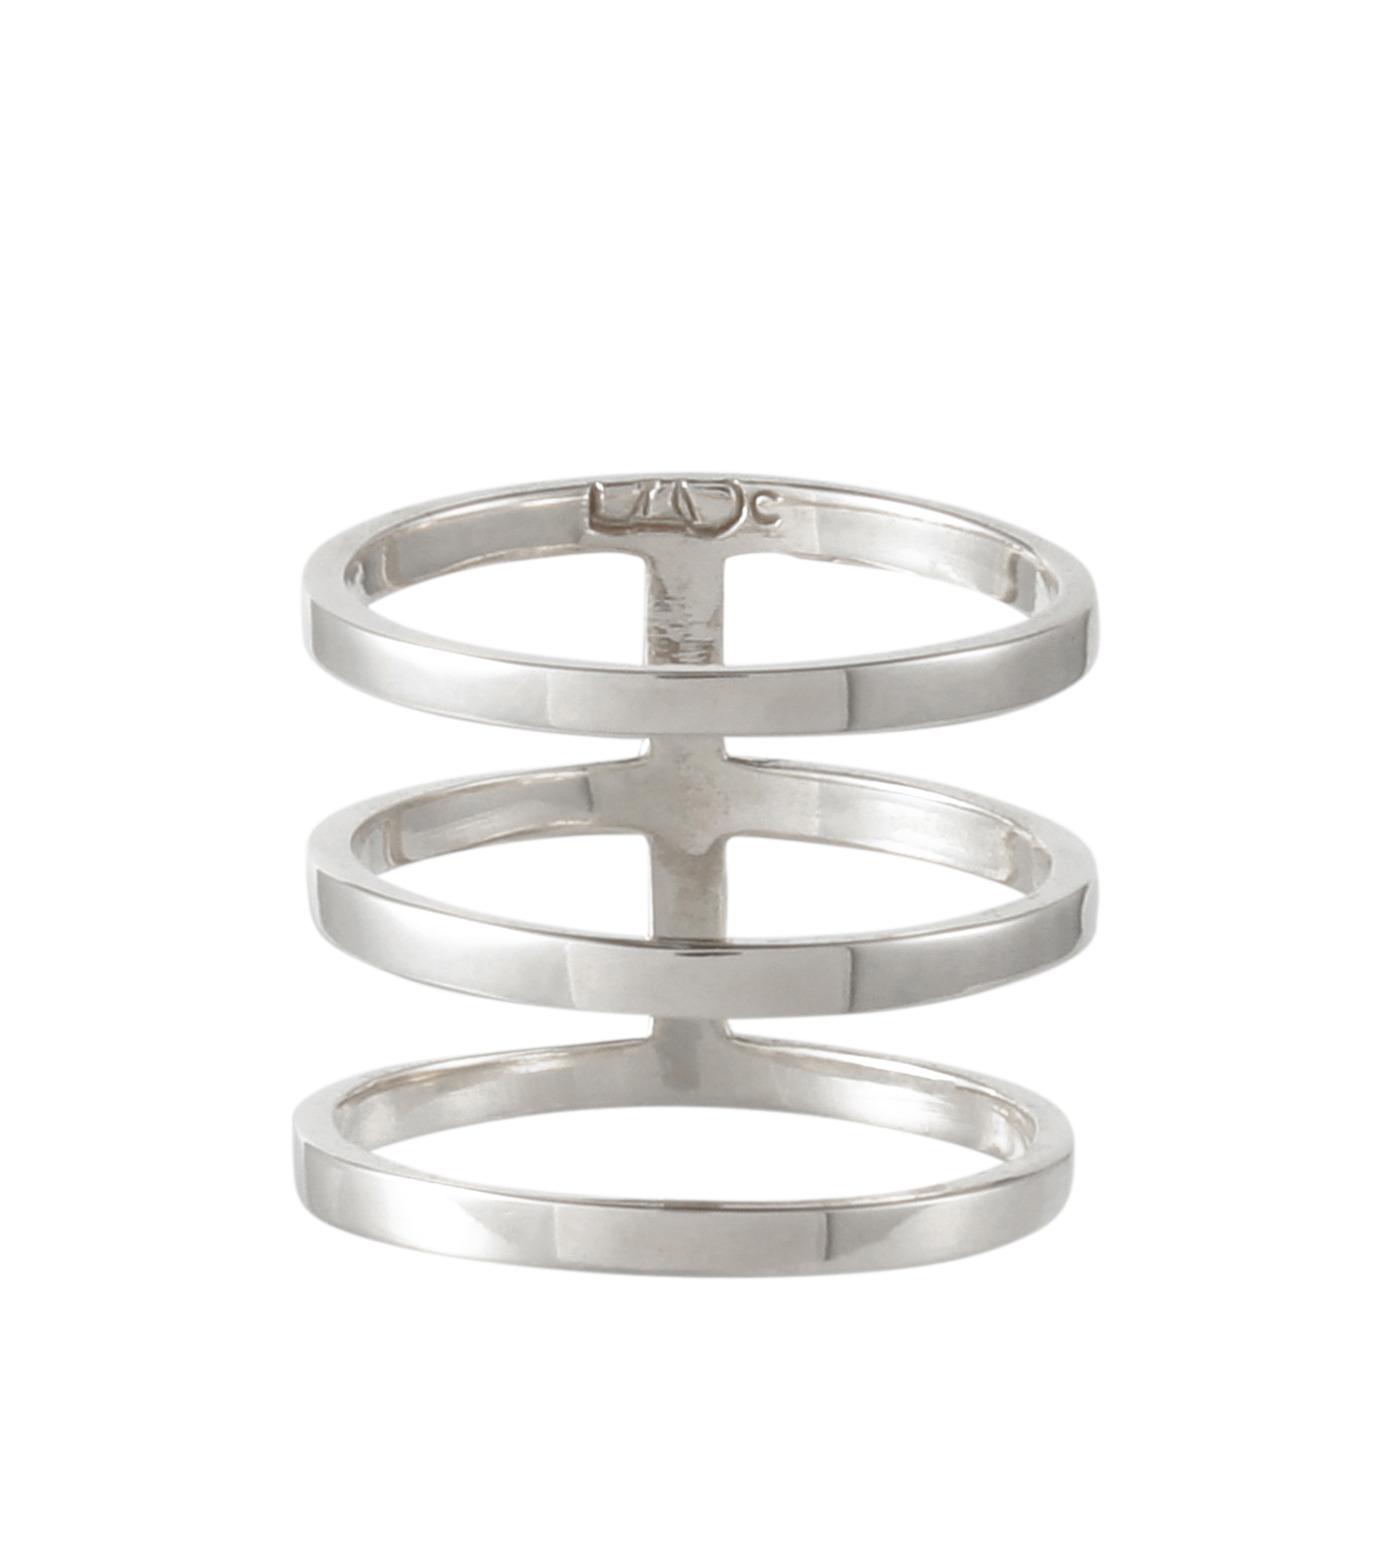 Campbell(キャンベル)のTribar Ring-SILVER(アクセサリー/accessory)-TRIBAR-RING-1 拡大詳細画像1